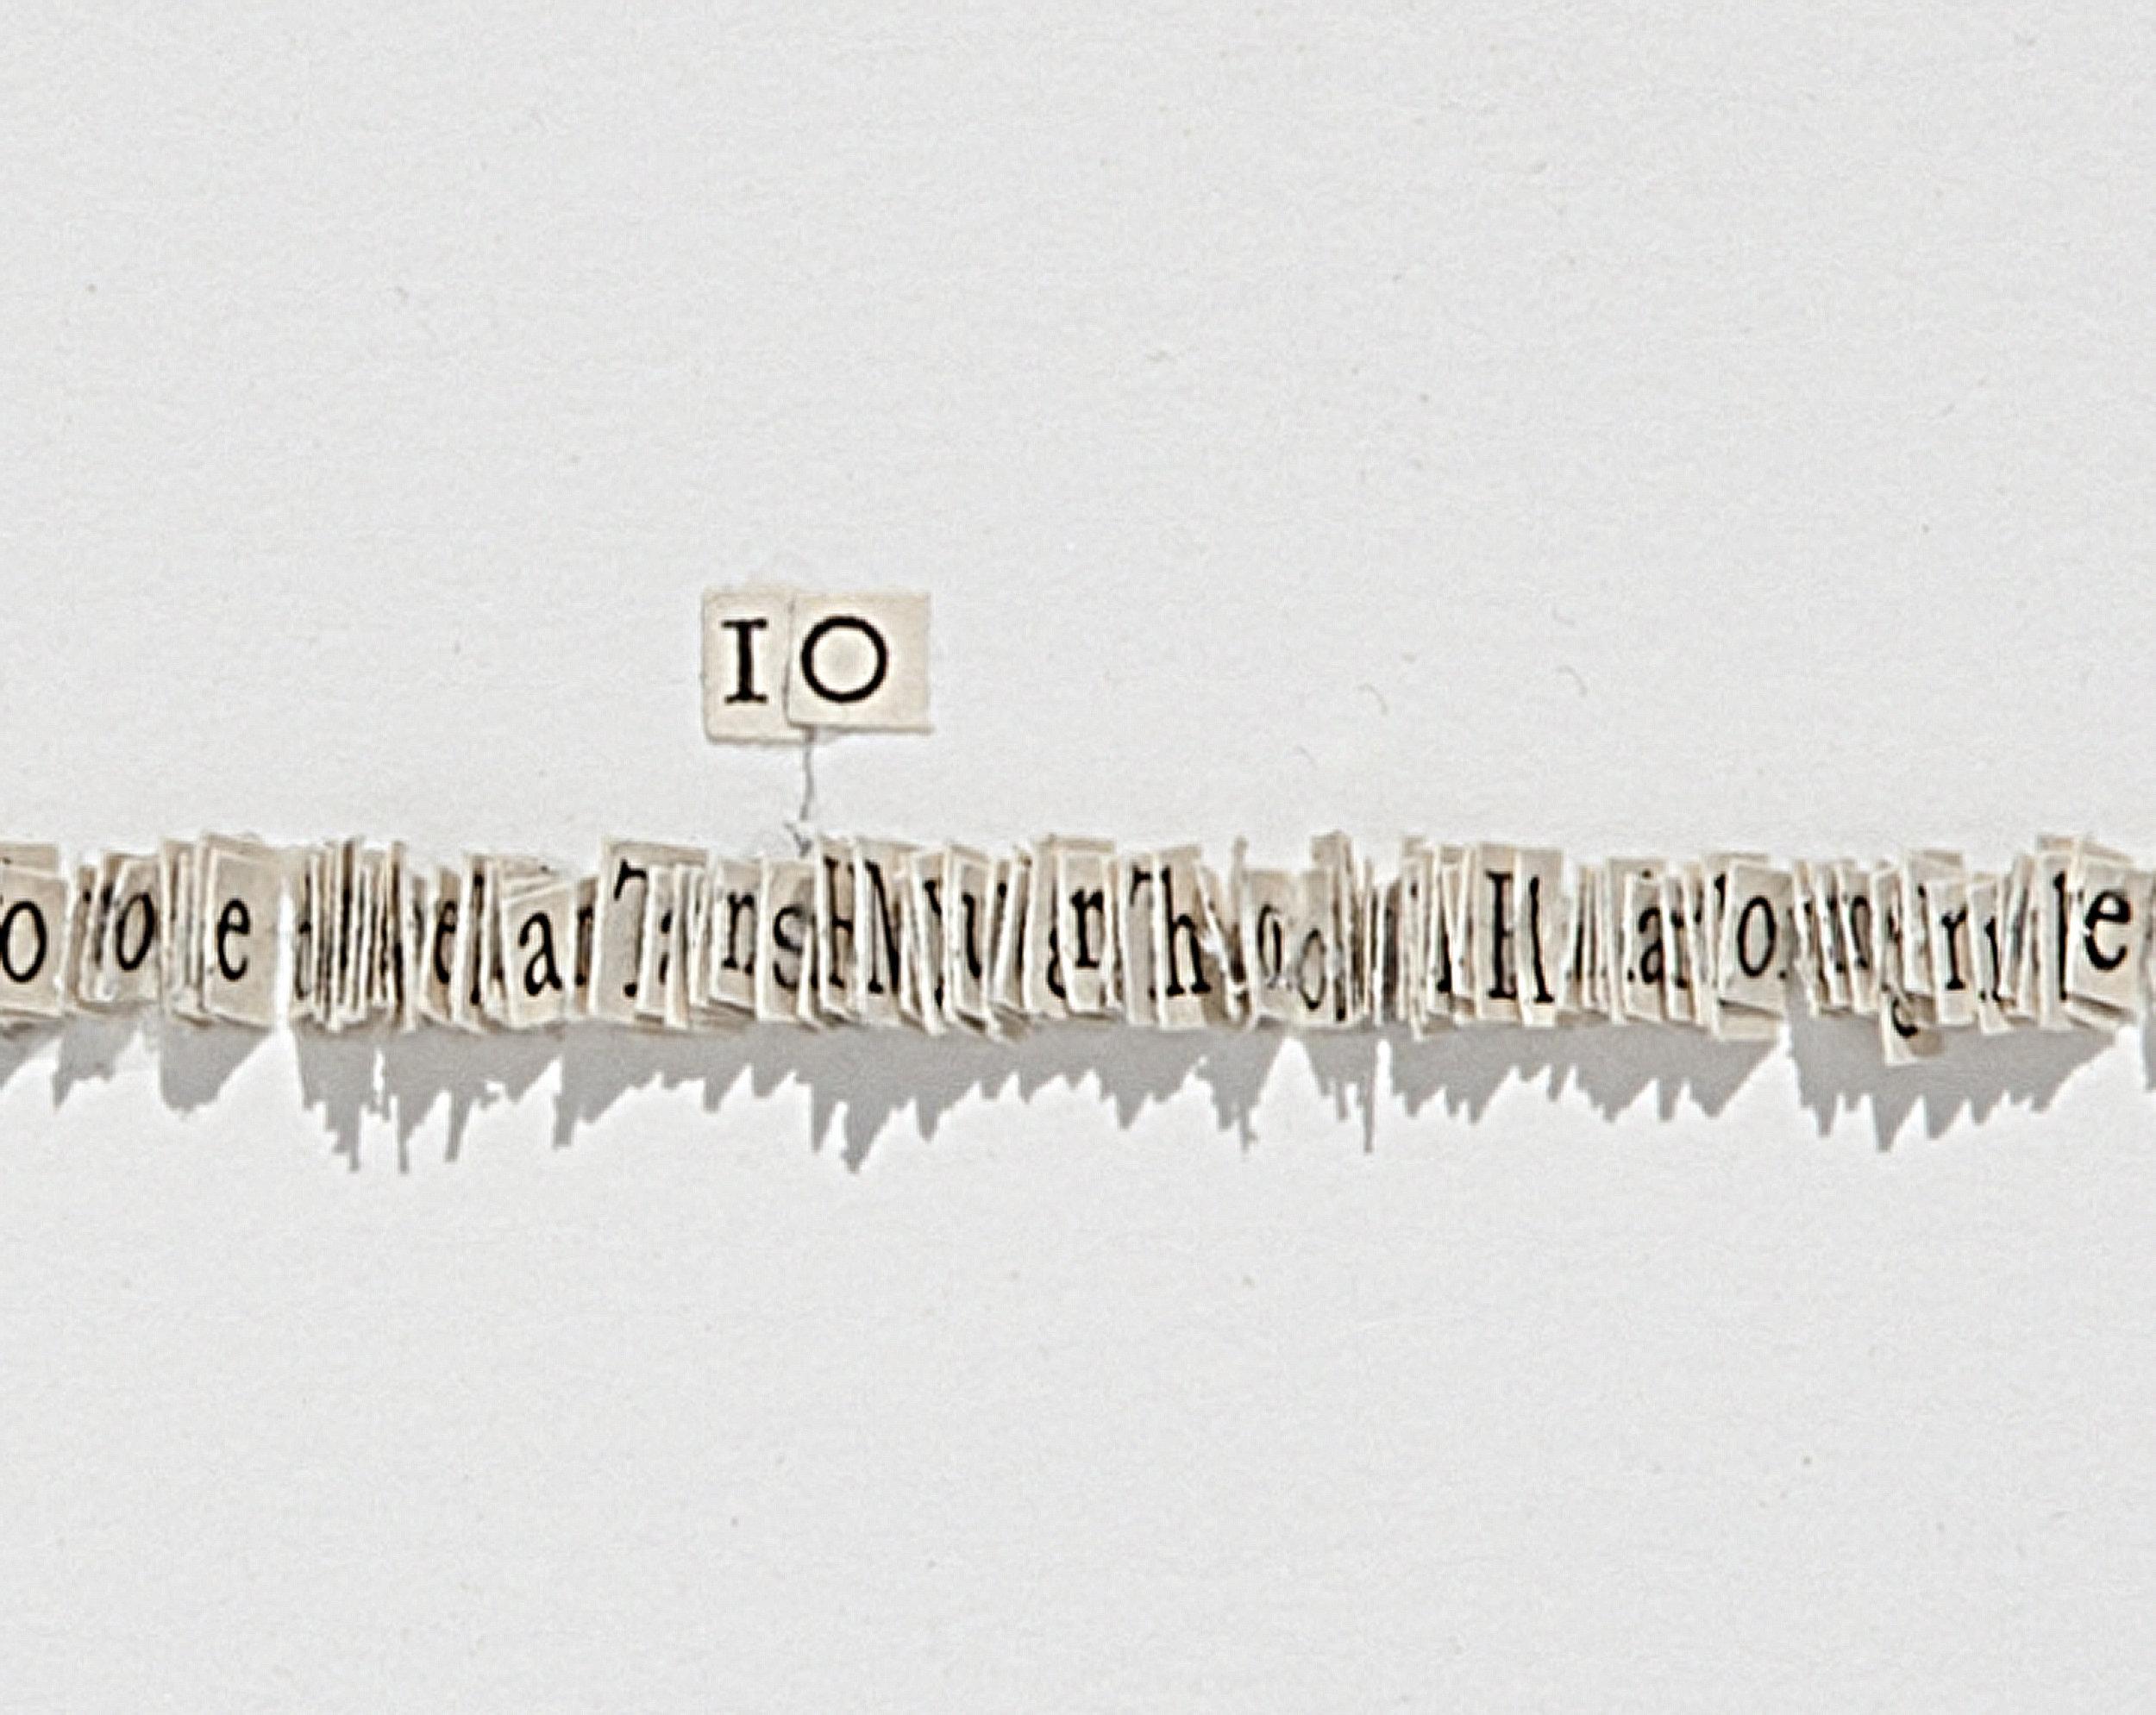 Ten-Hail-Marys-large detail).jpg